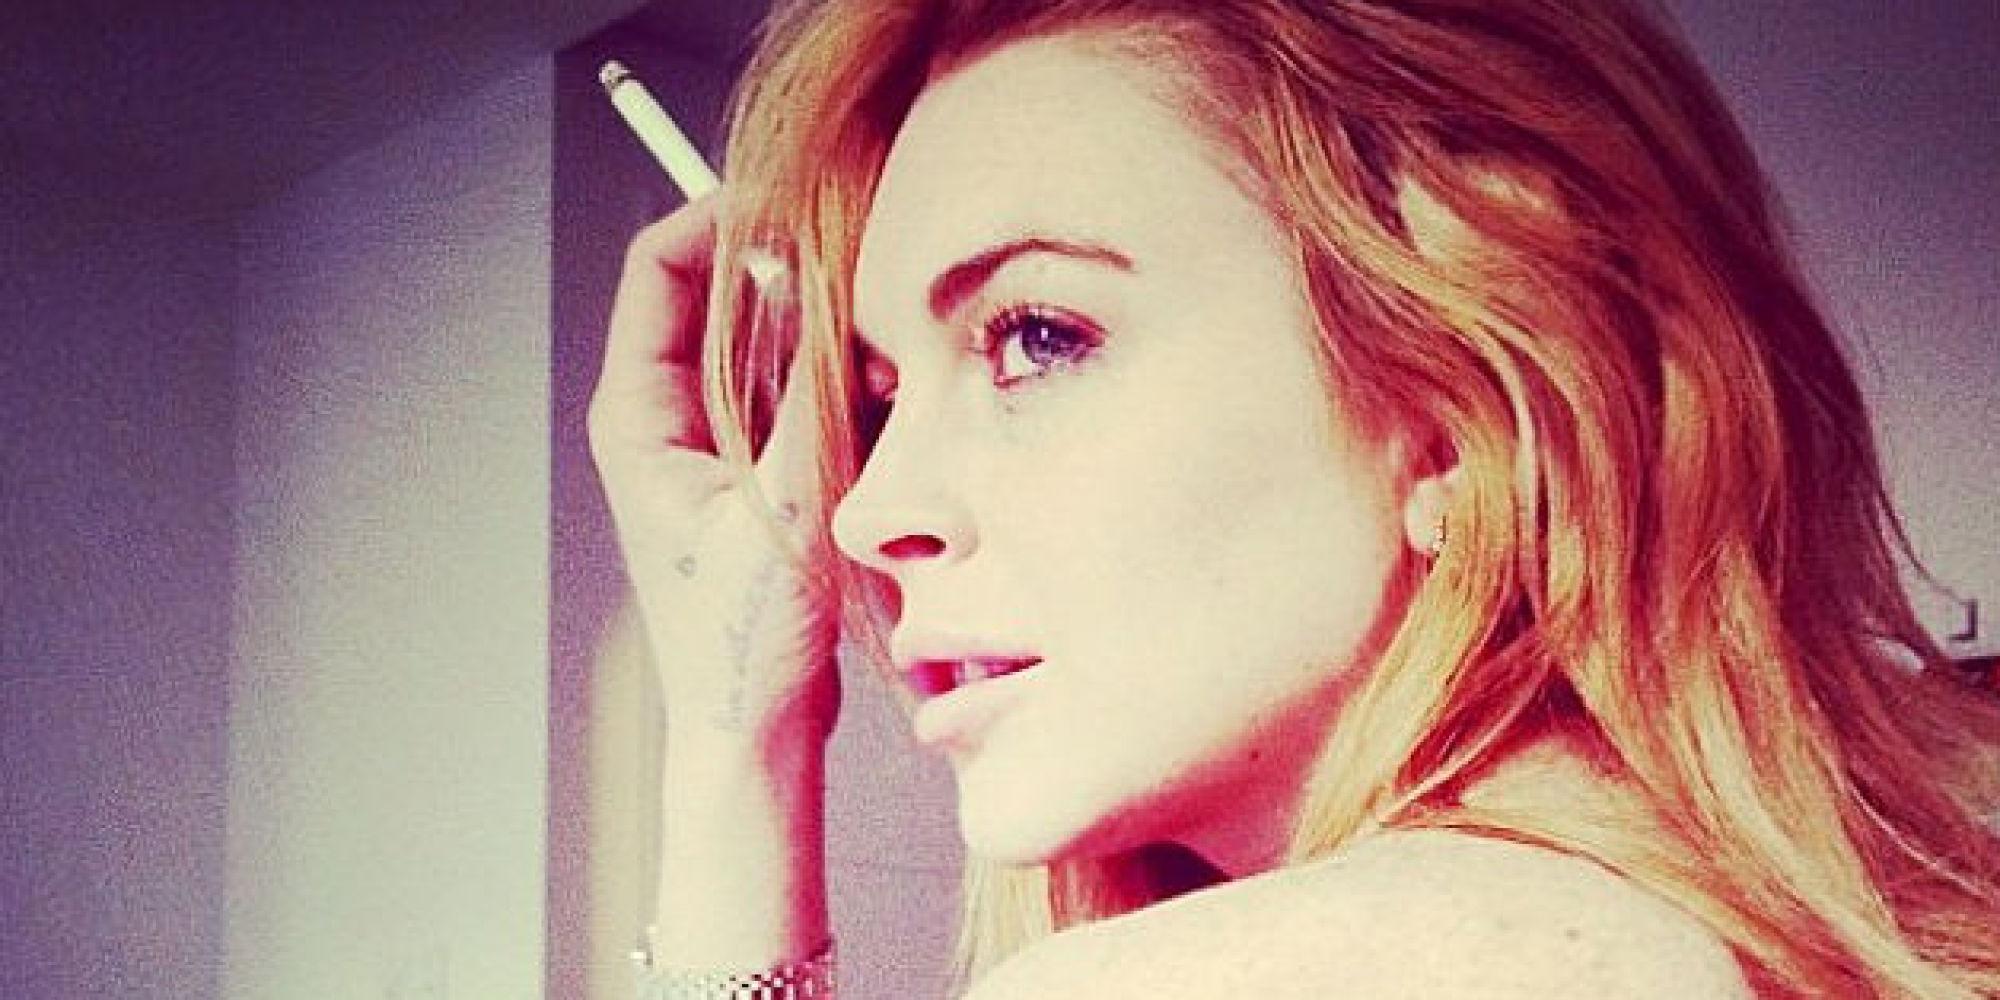 Lindsay Lohan Naked Selfies